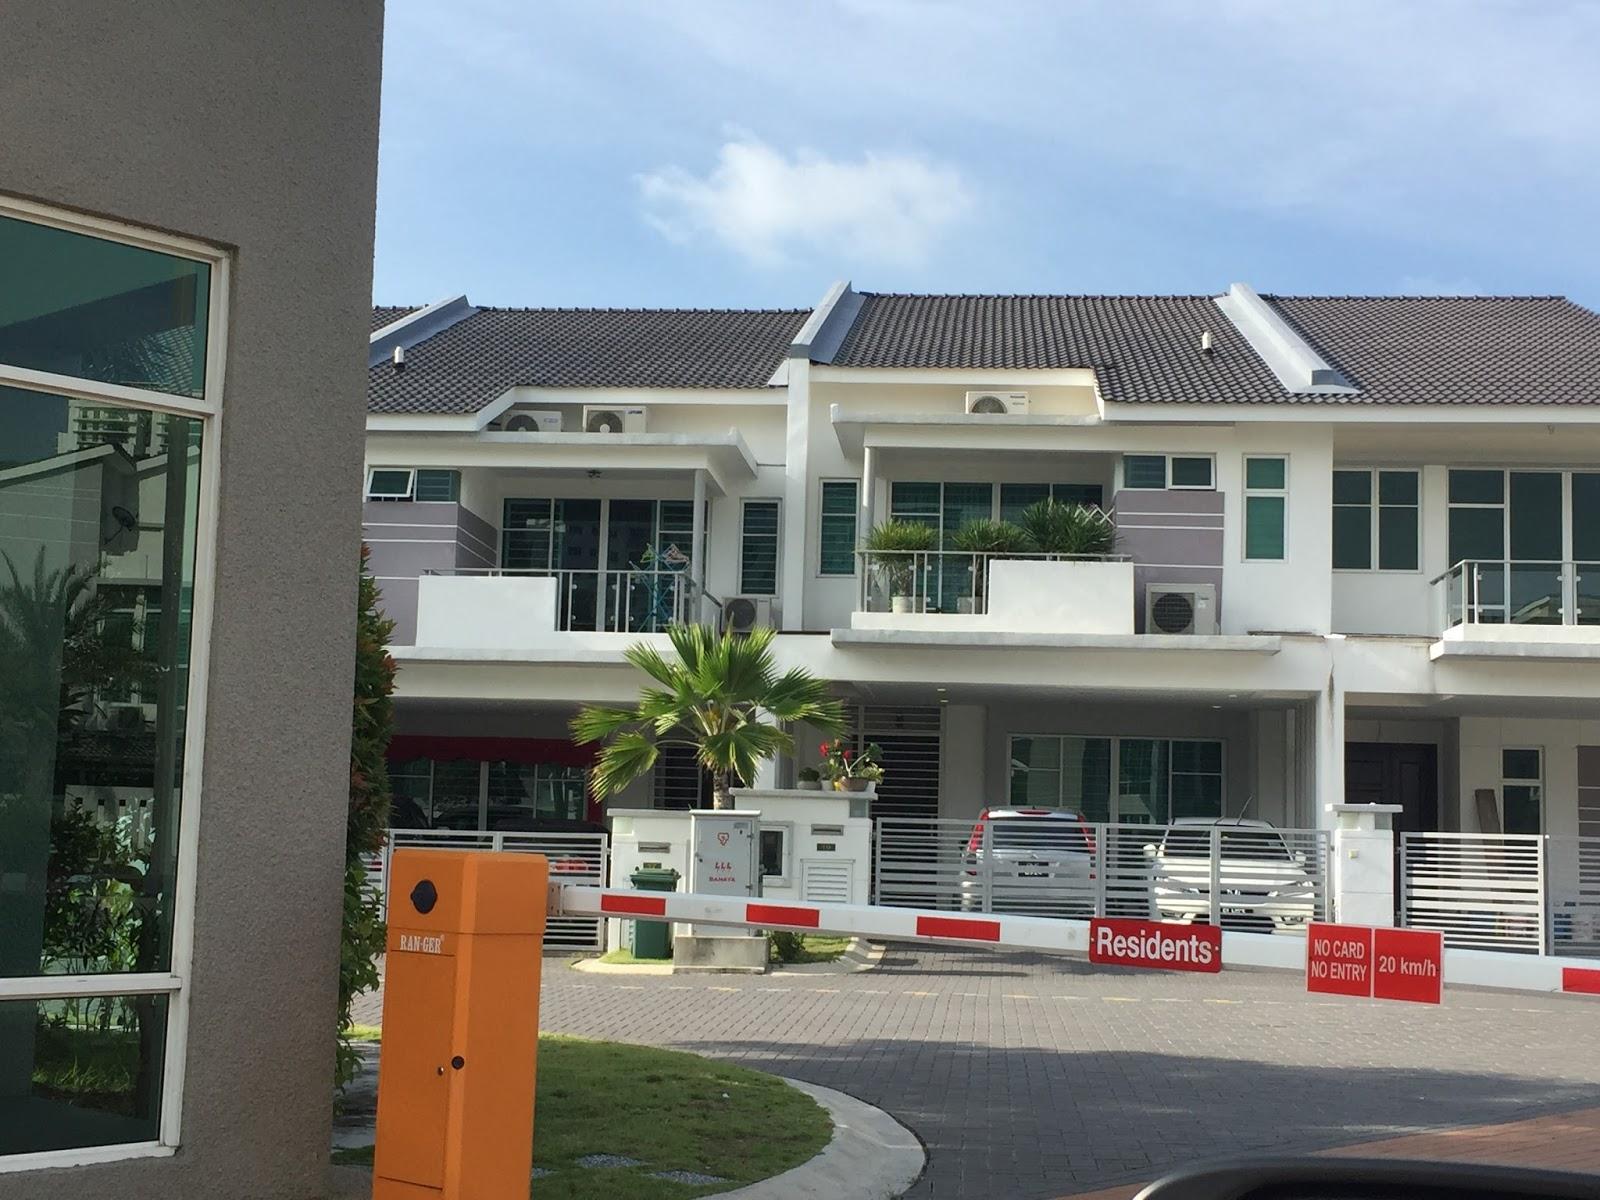 Pn Tay 39 S Blog Road To Penang Wedding Breakfast With John In Penang